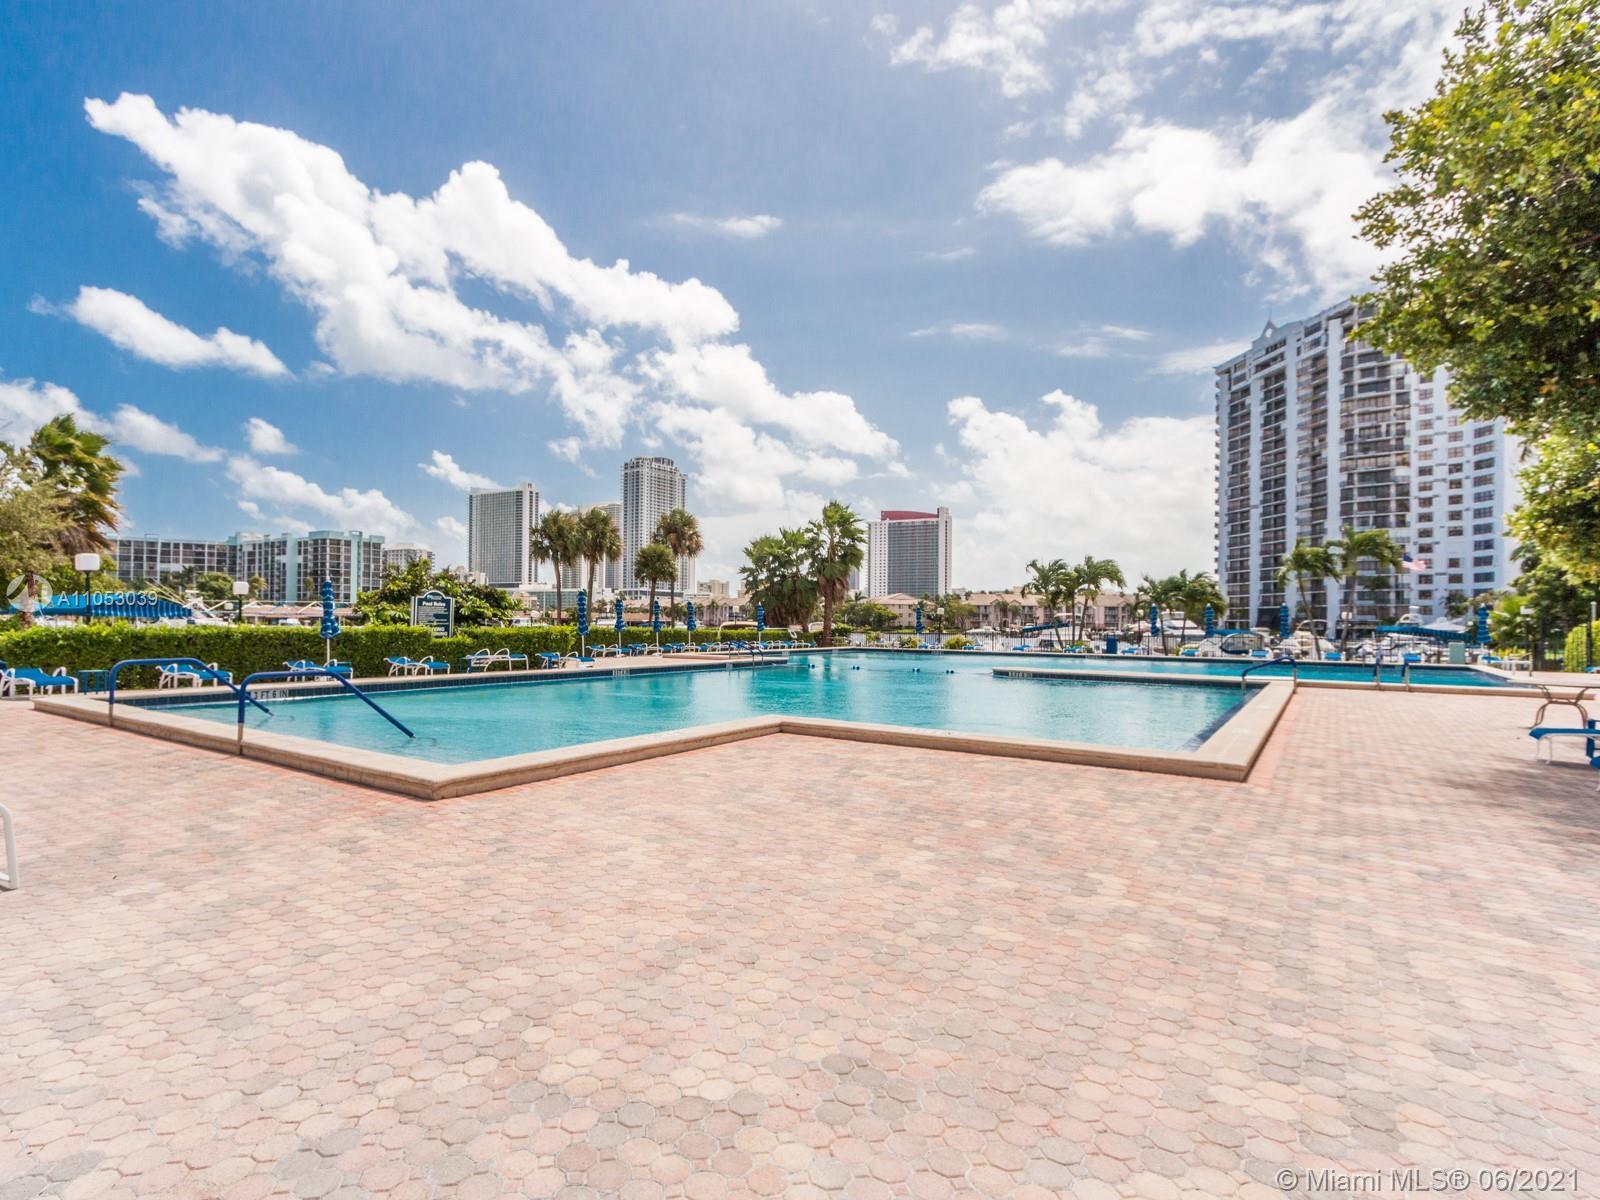 Photo of 600 Three Islands Blvd #312, Hallandale Beach, Florida, 33009 - MARINA POOL